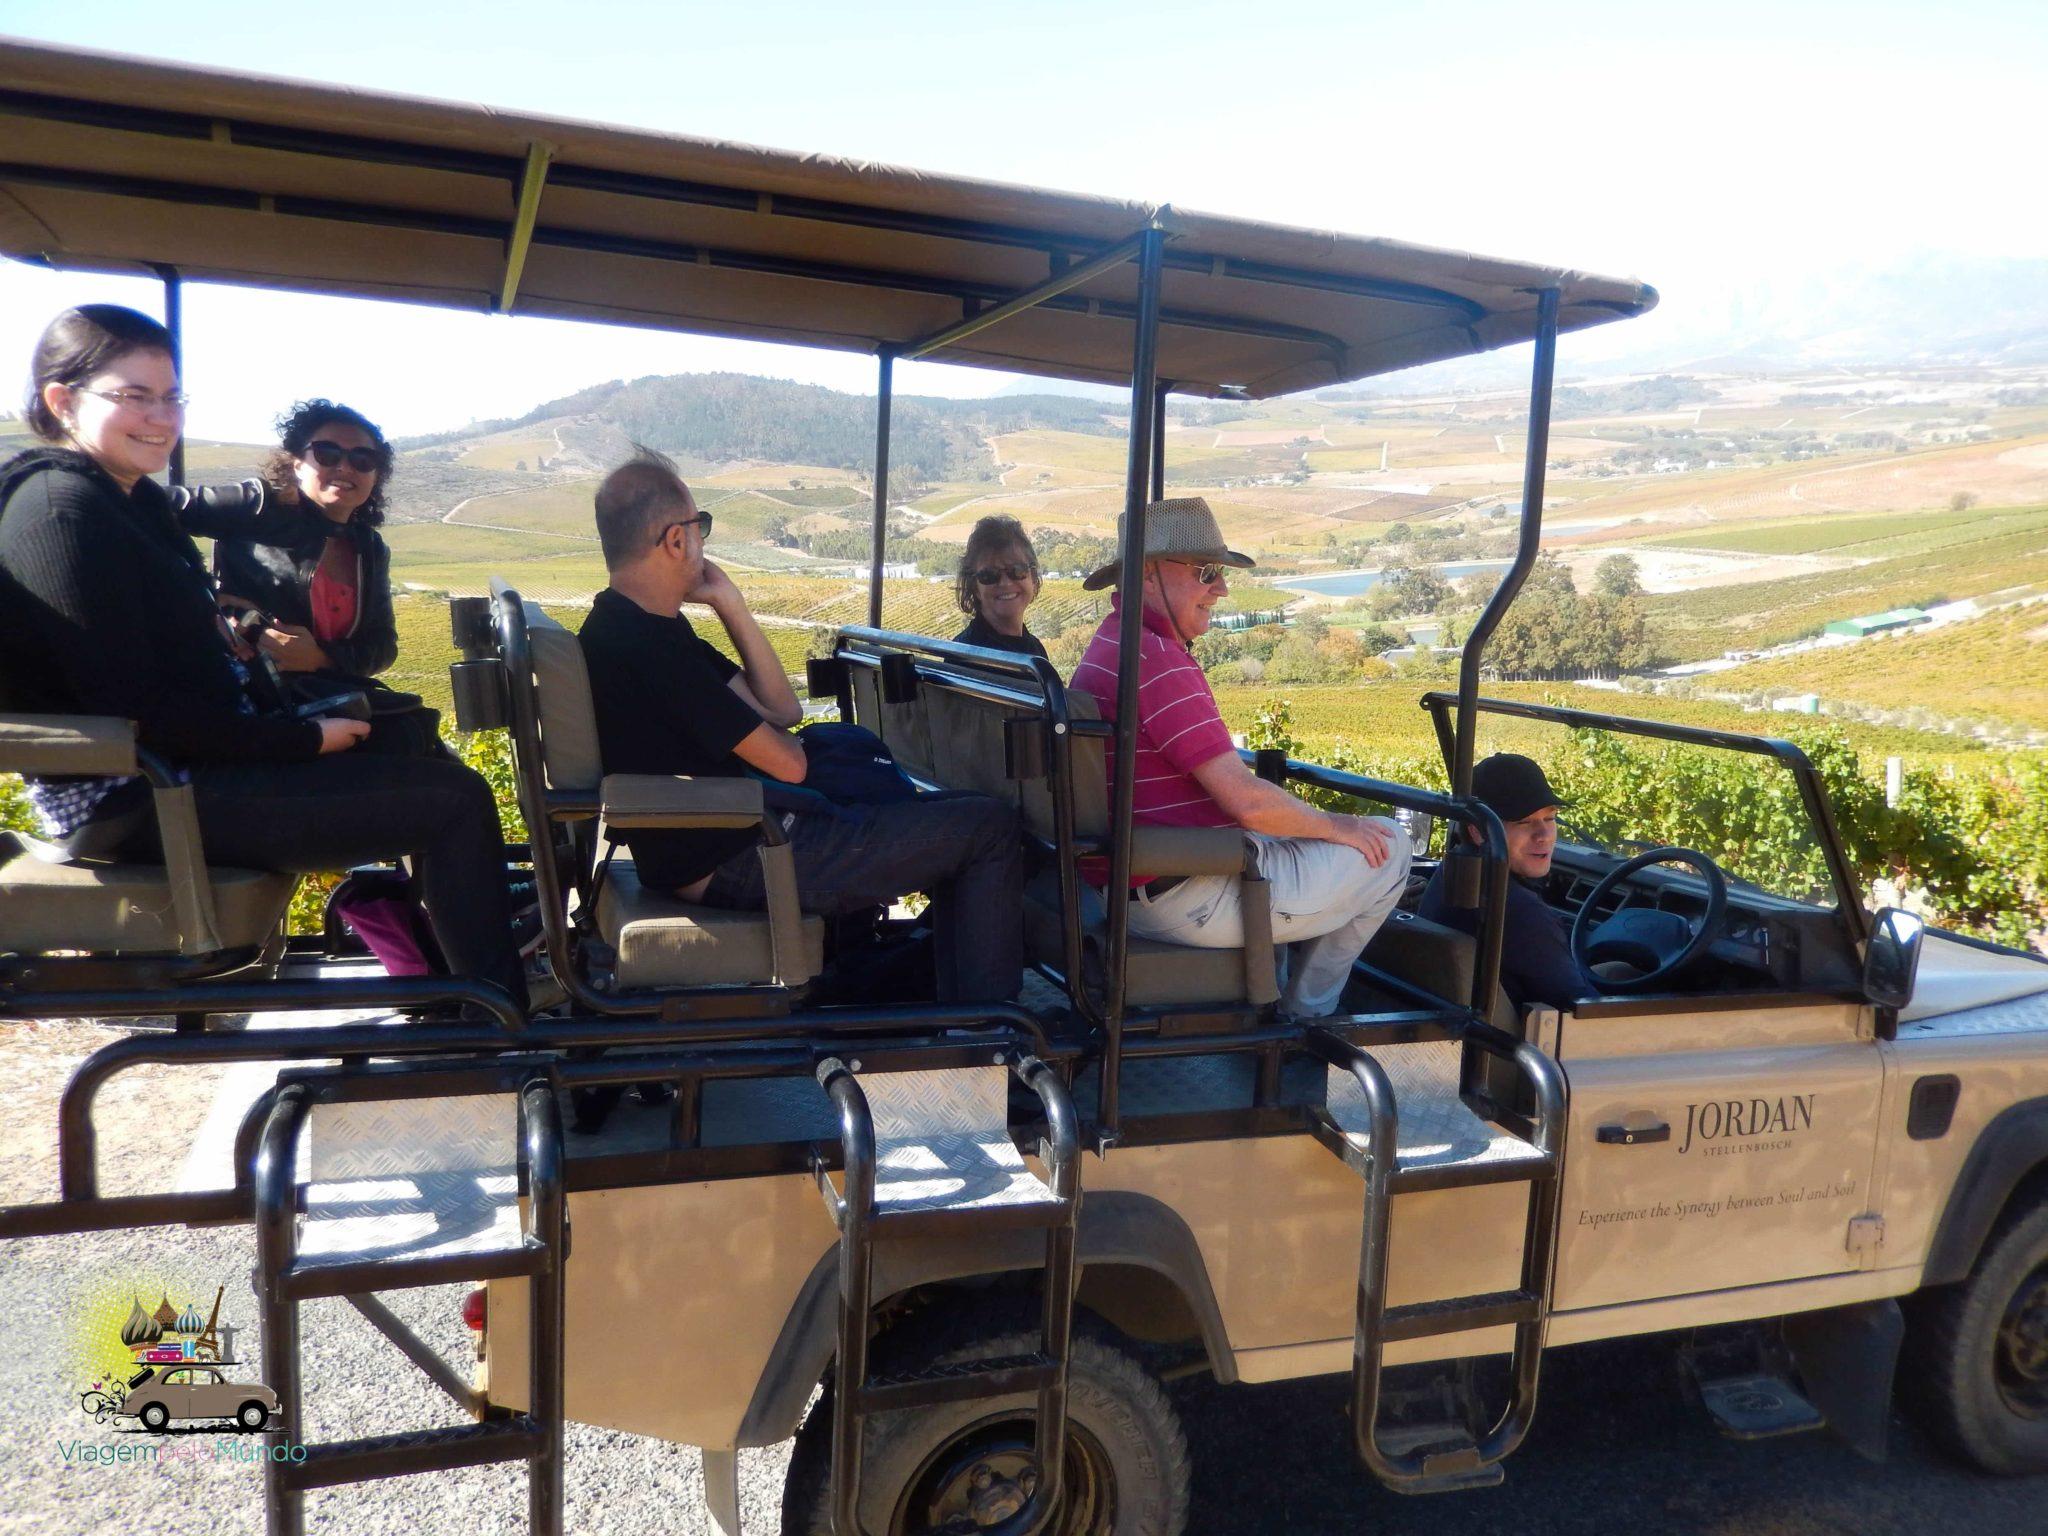 Jordan Wine State